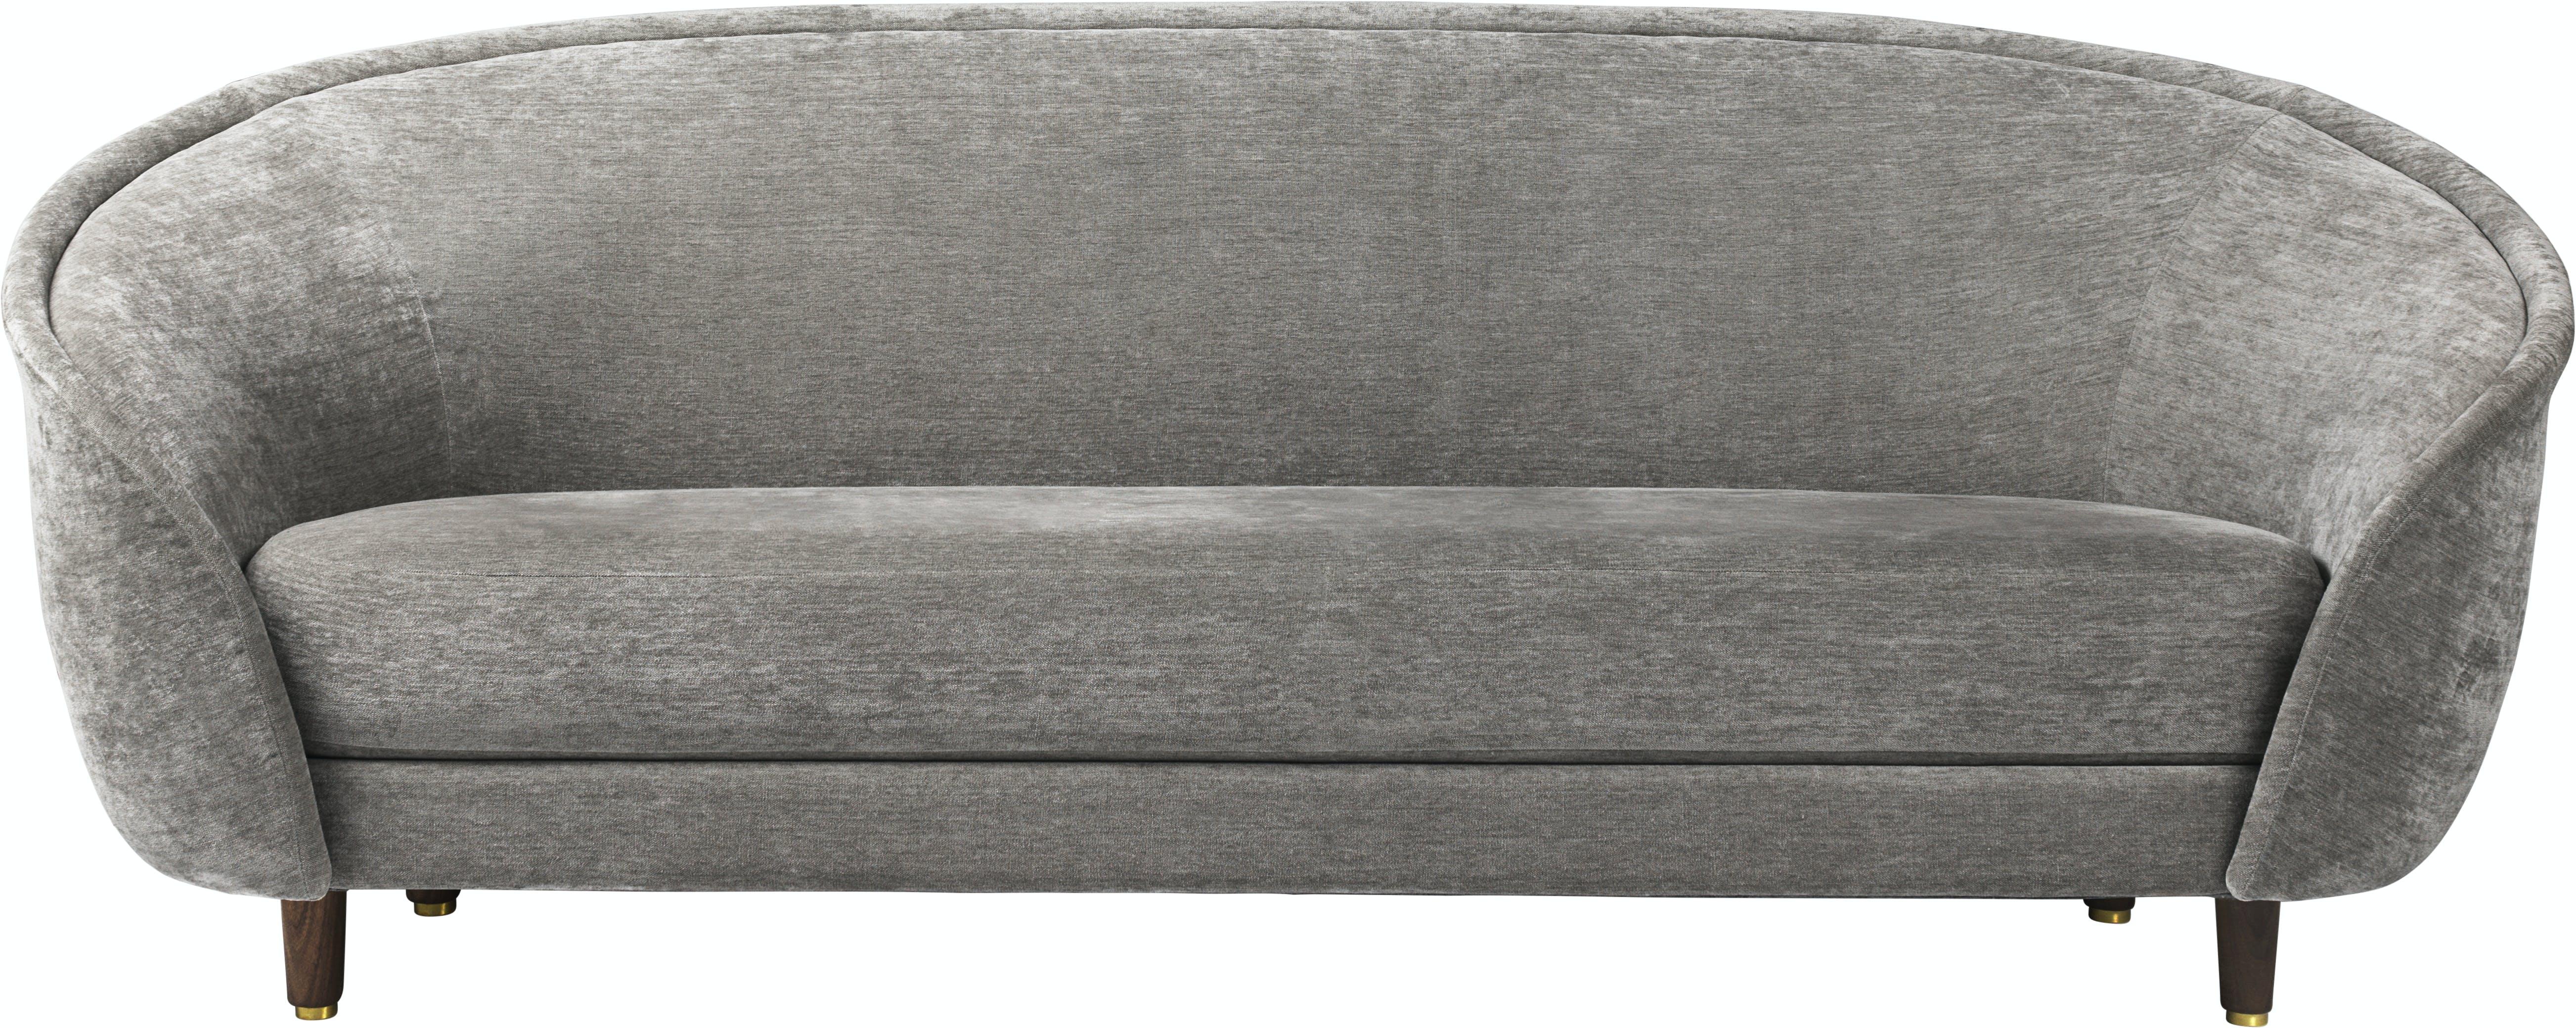 Revers Sofa 215X100 Wood Fully Upholstered American Walnut Dedar Belsuede 011 Front 1